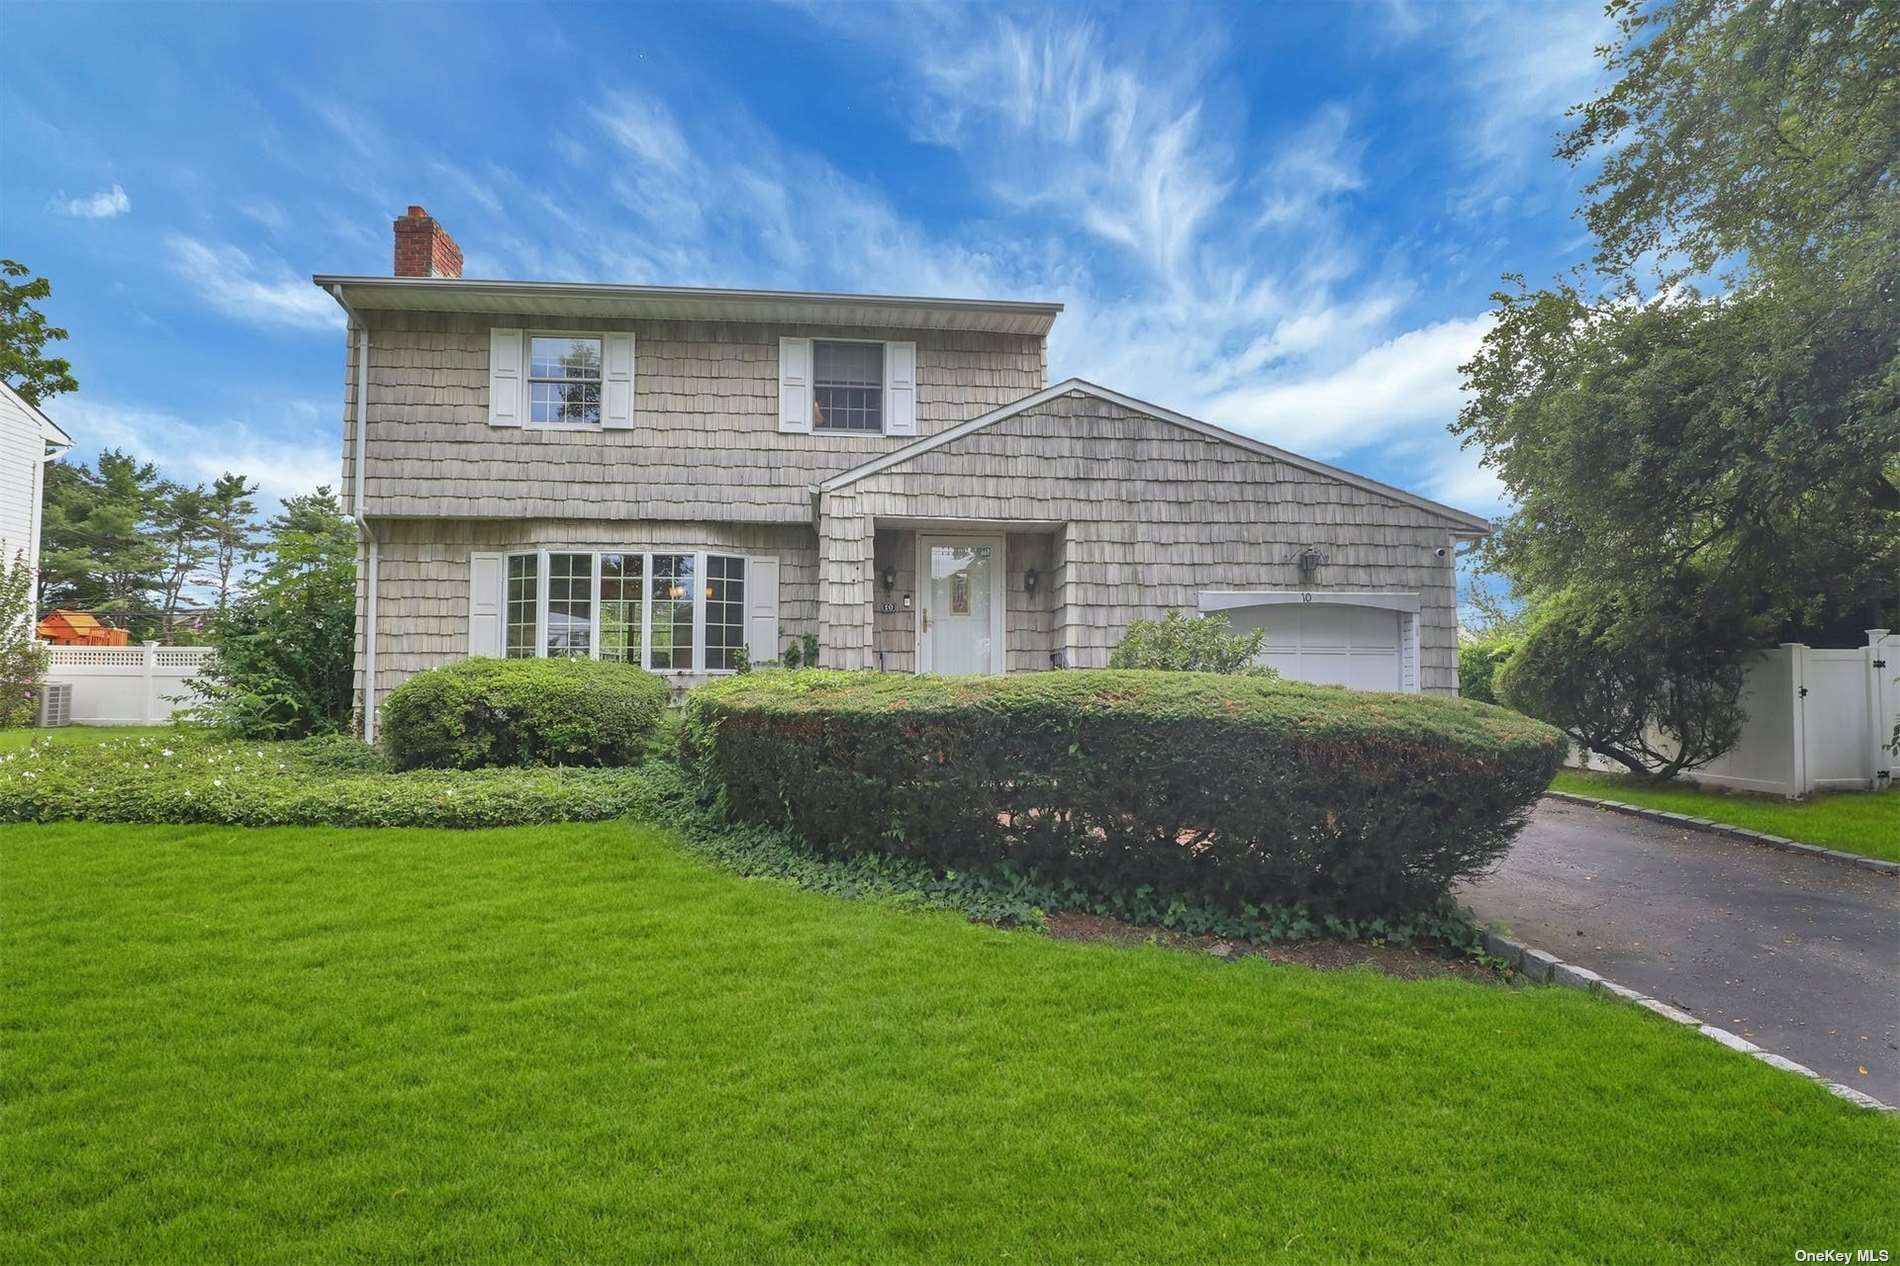 10 Elderwood Lane, Melville, NY 11747 - MLS#: 3336163